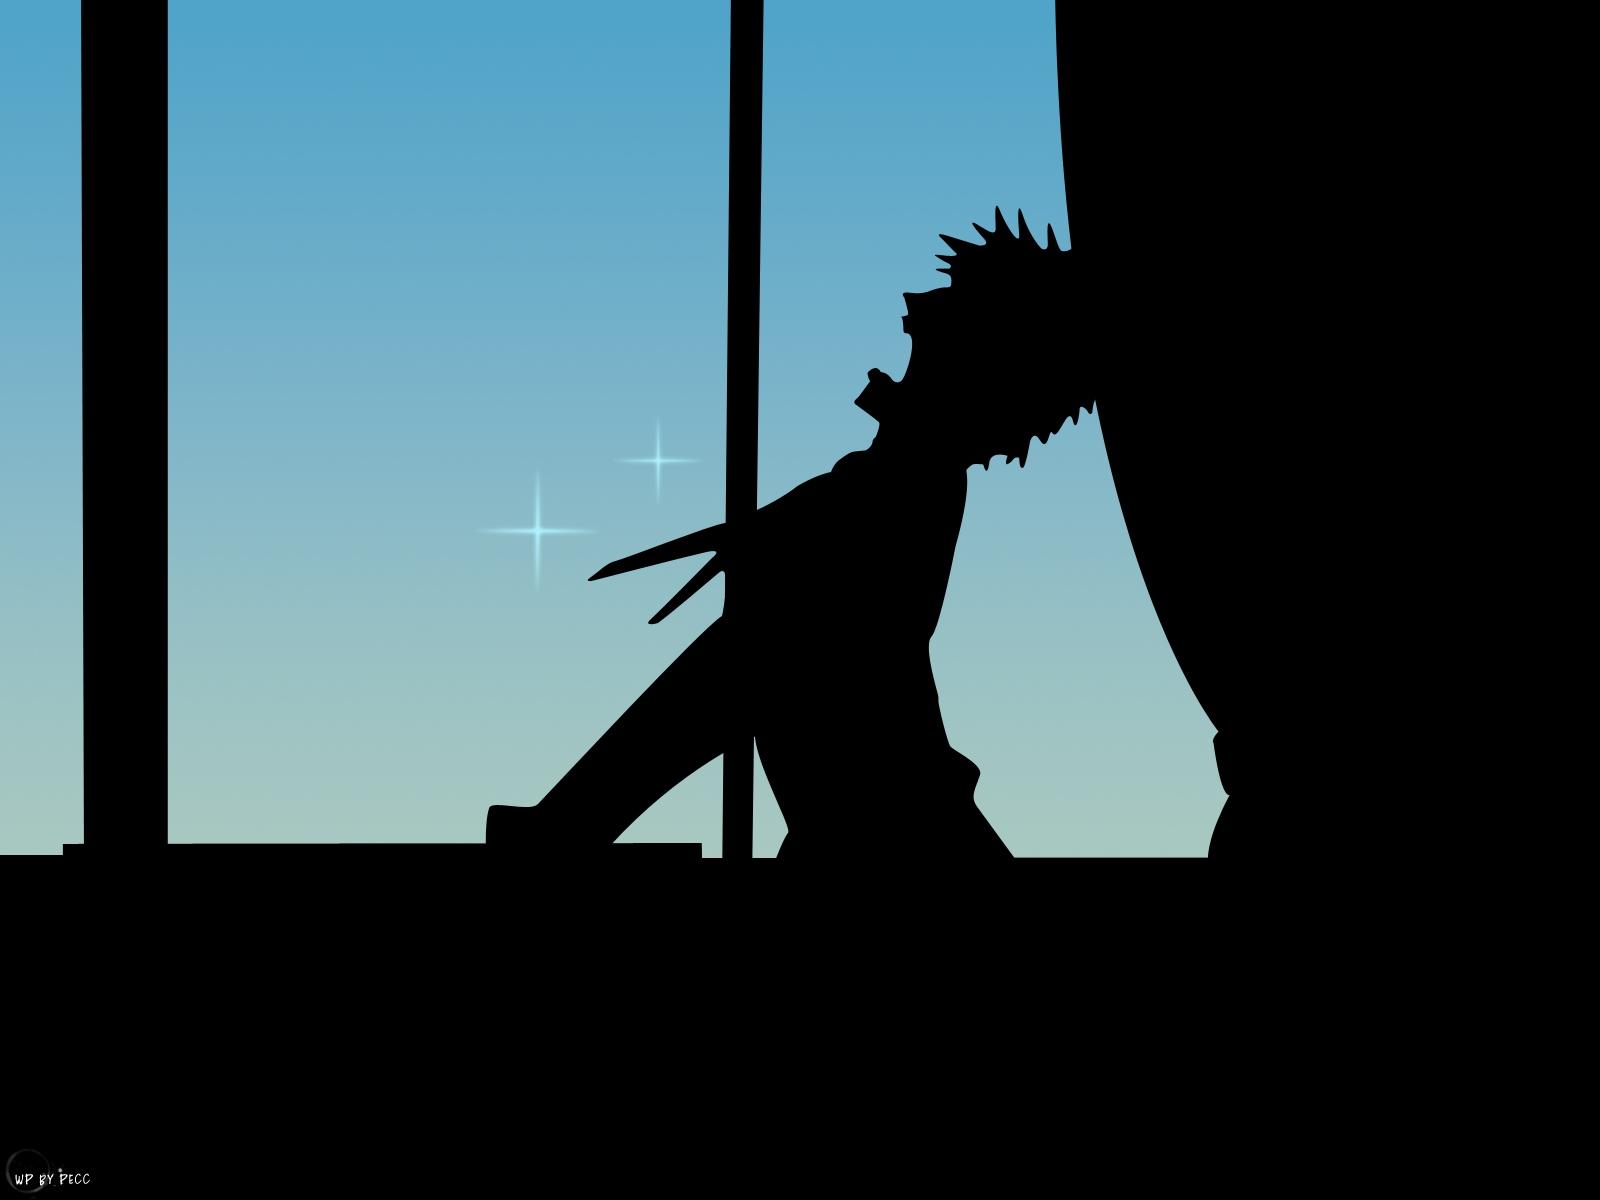 azumanga_daioh black blue kimura silhouette